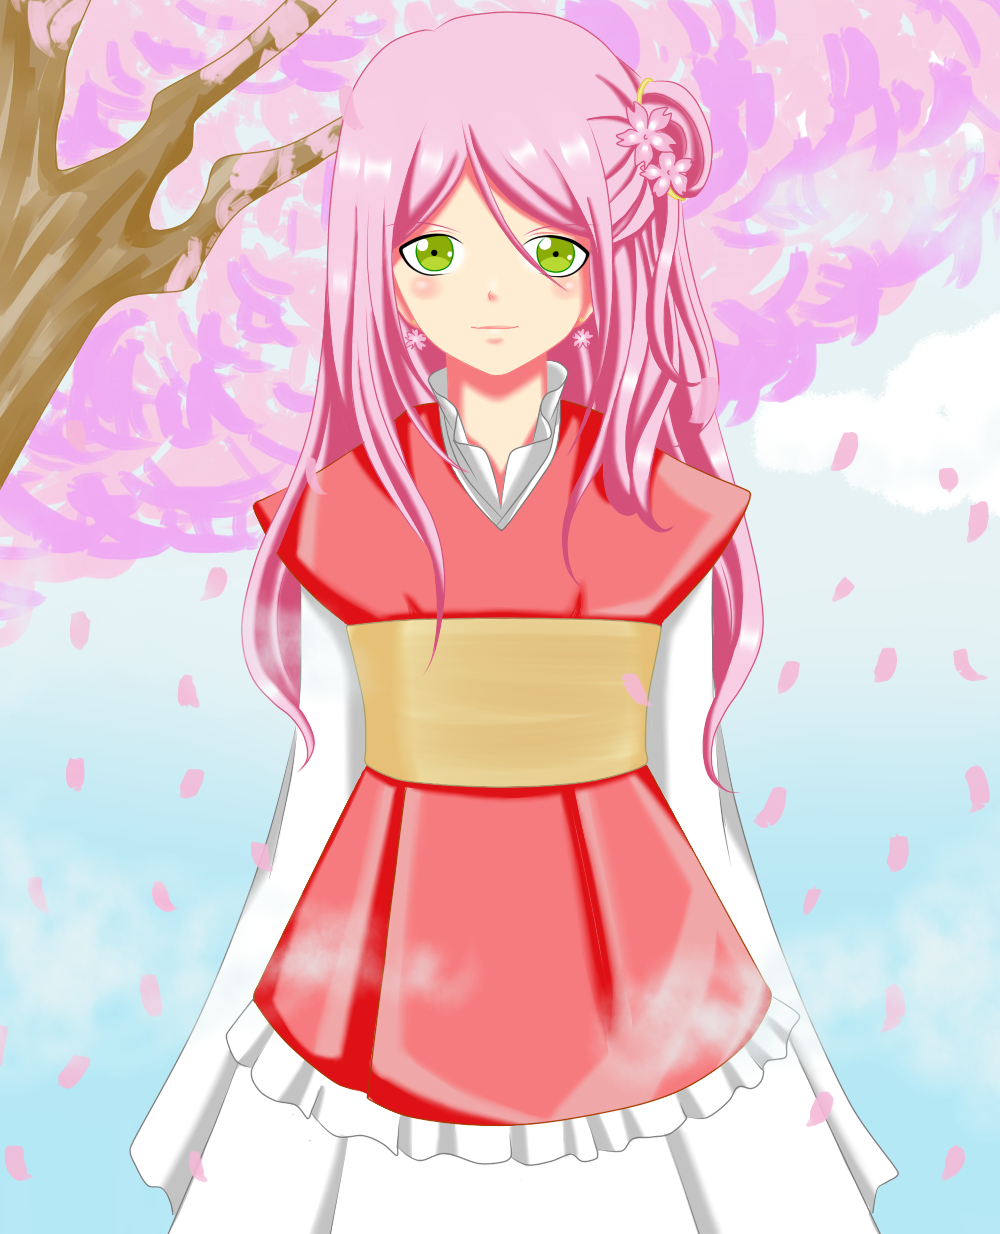 Cherry blossom.com online dating site in Australia